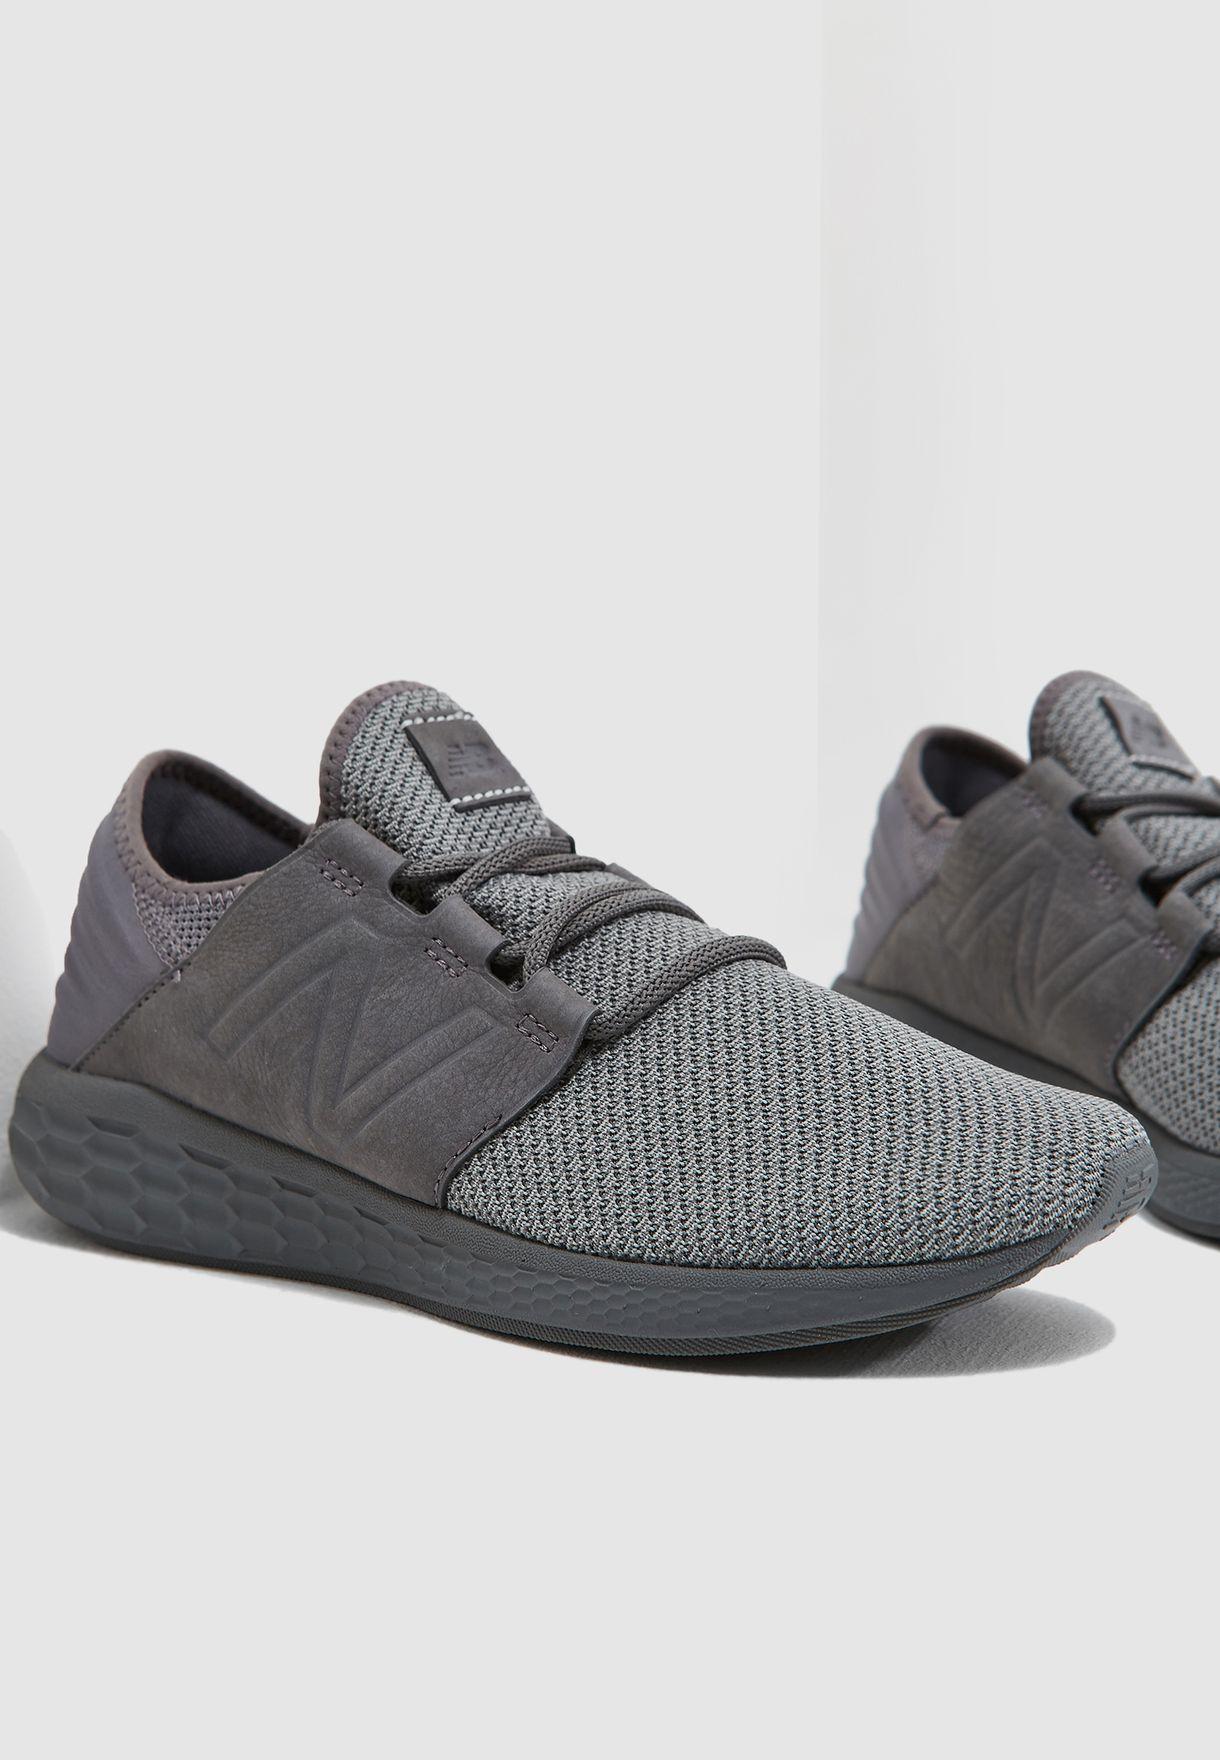 edf05de53 تسوق حذاء كروز ان بي كيه ماركة نيو بالانس لون رمادي MCRUZNG2 في ...